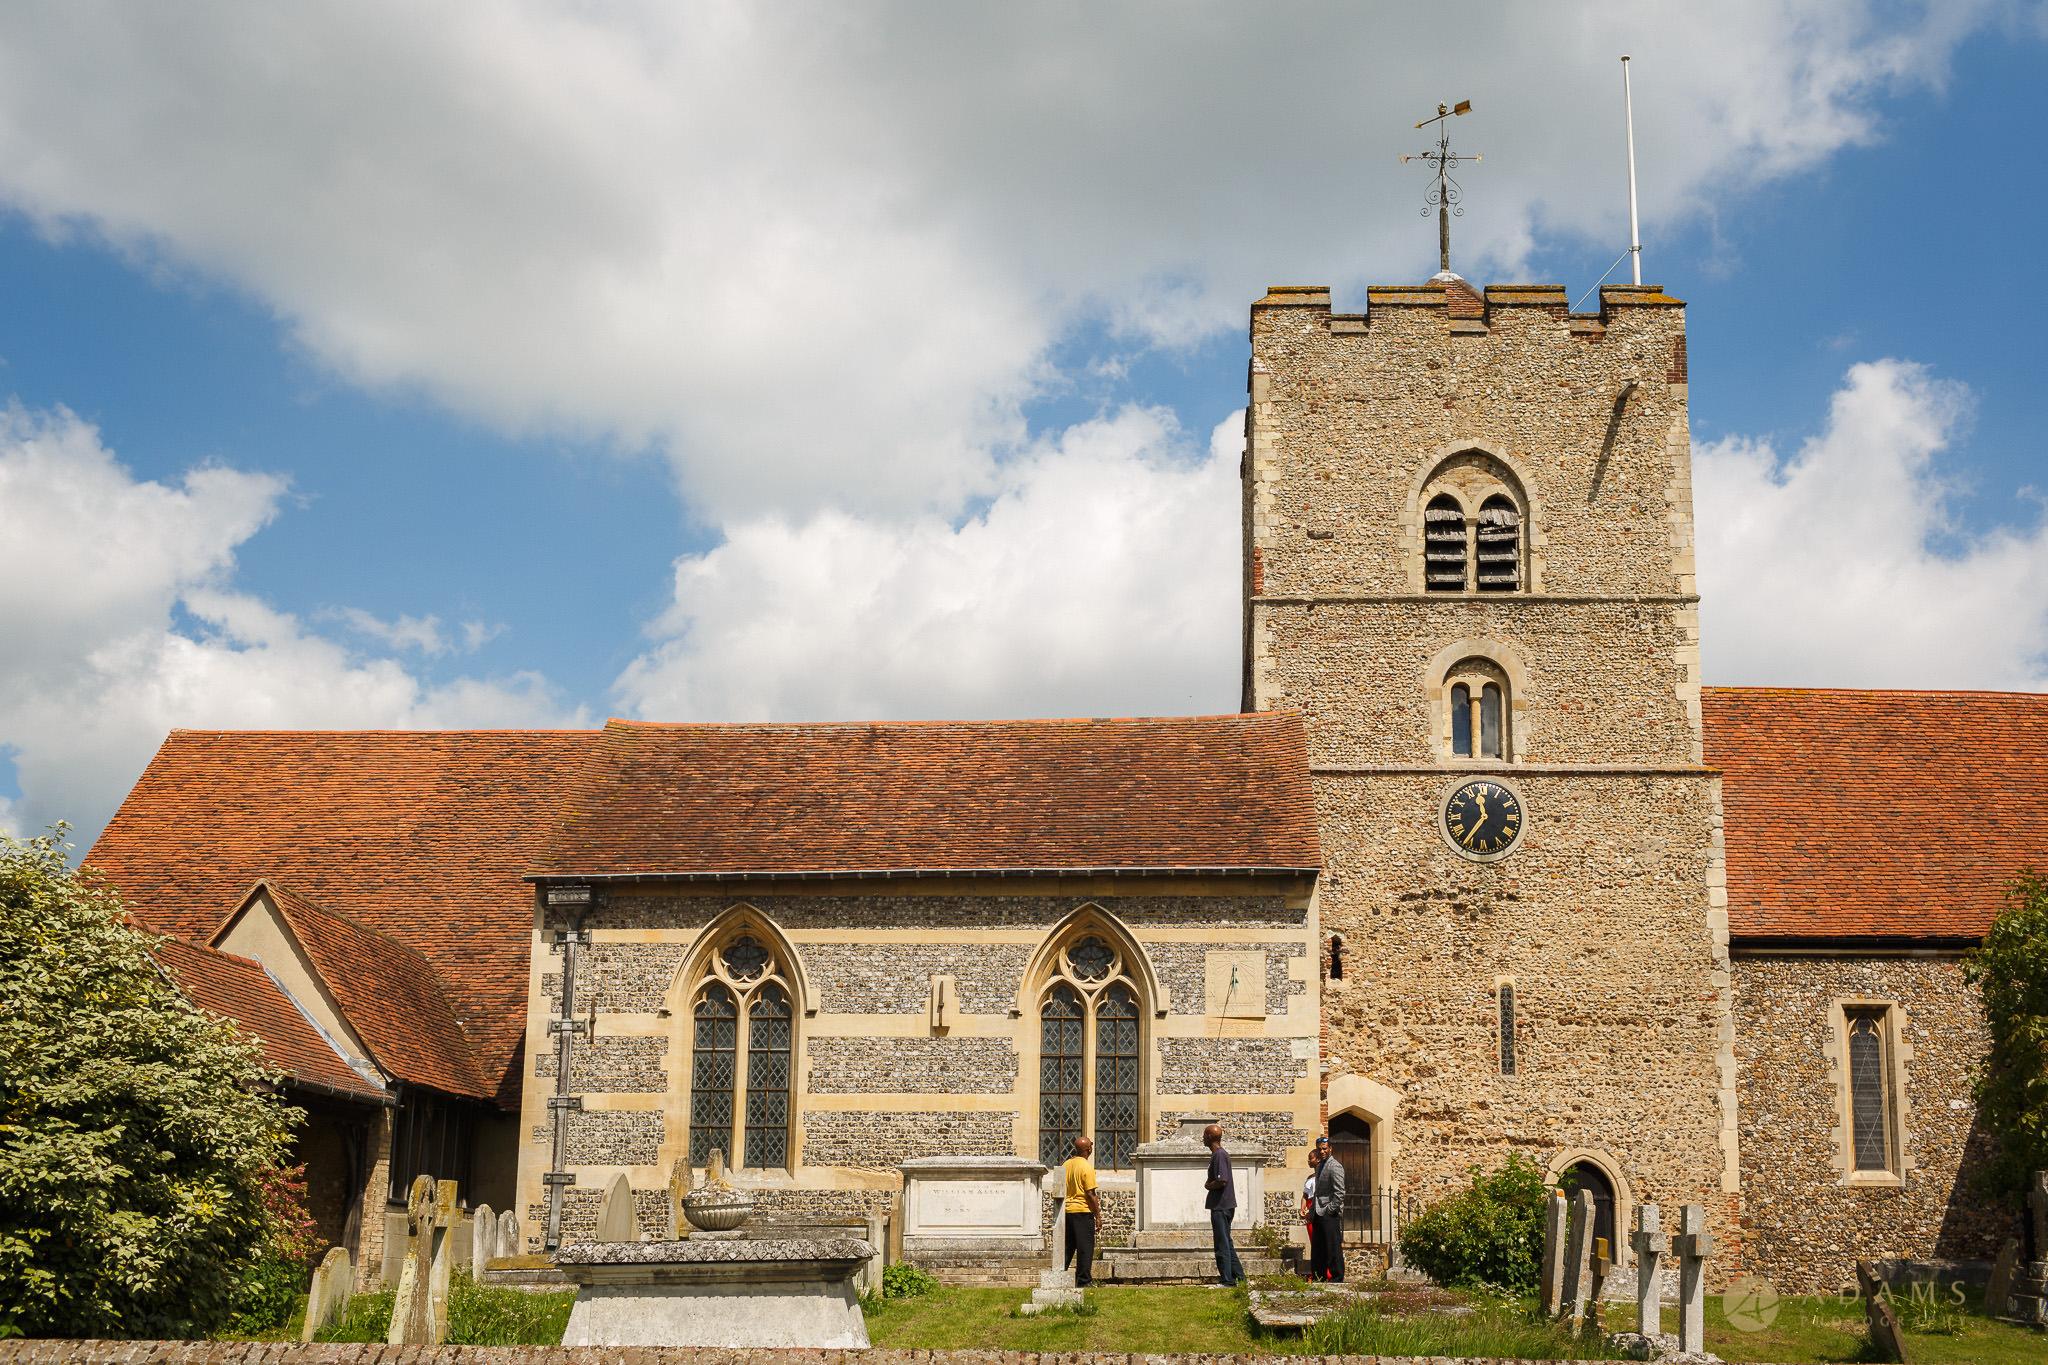 church nearby Boreham House